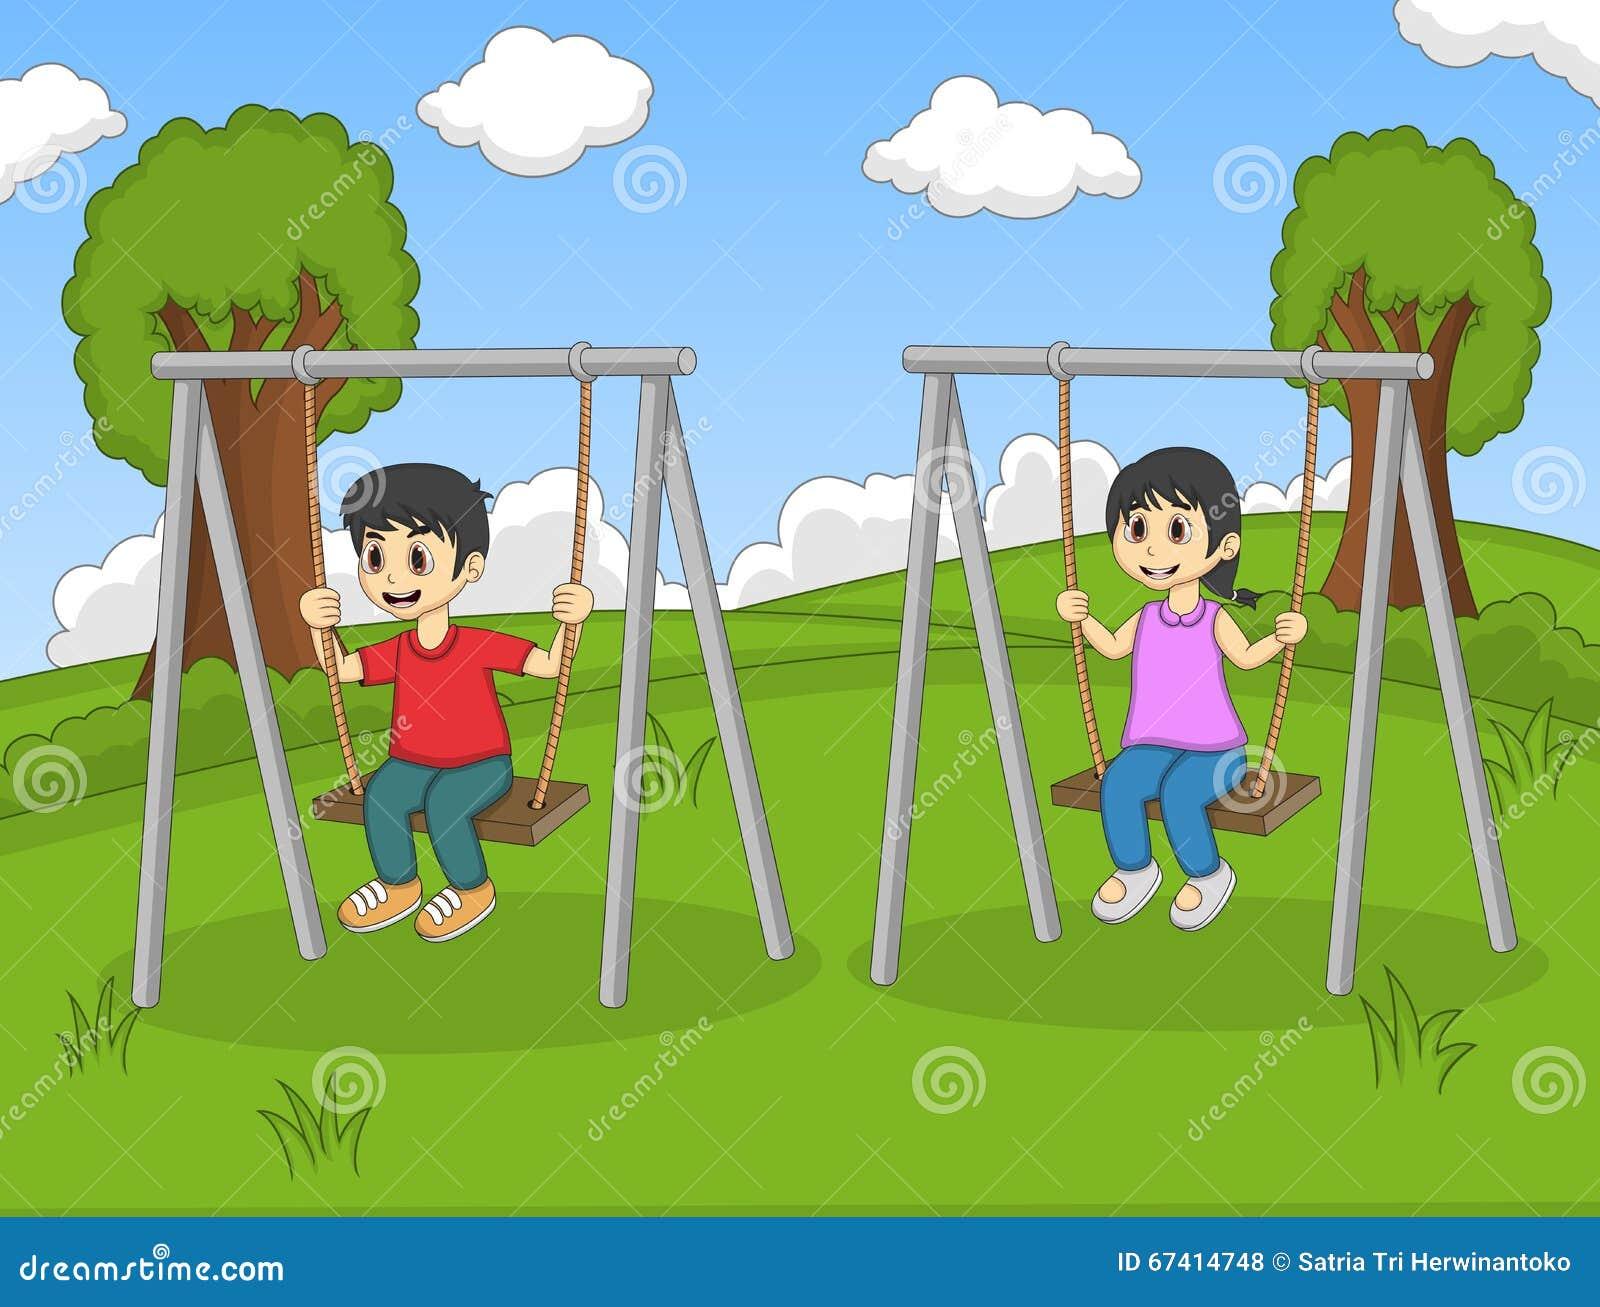 children play swing in the park cartoon stock vector - illustration